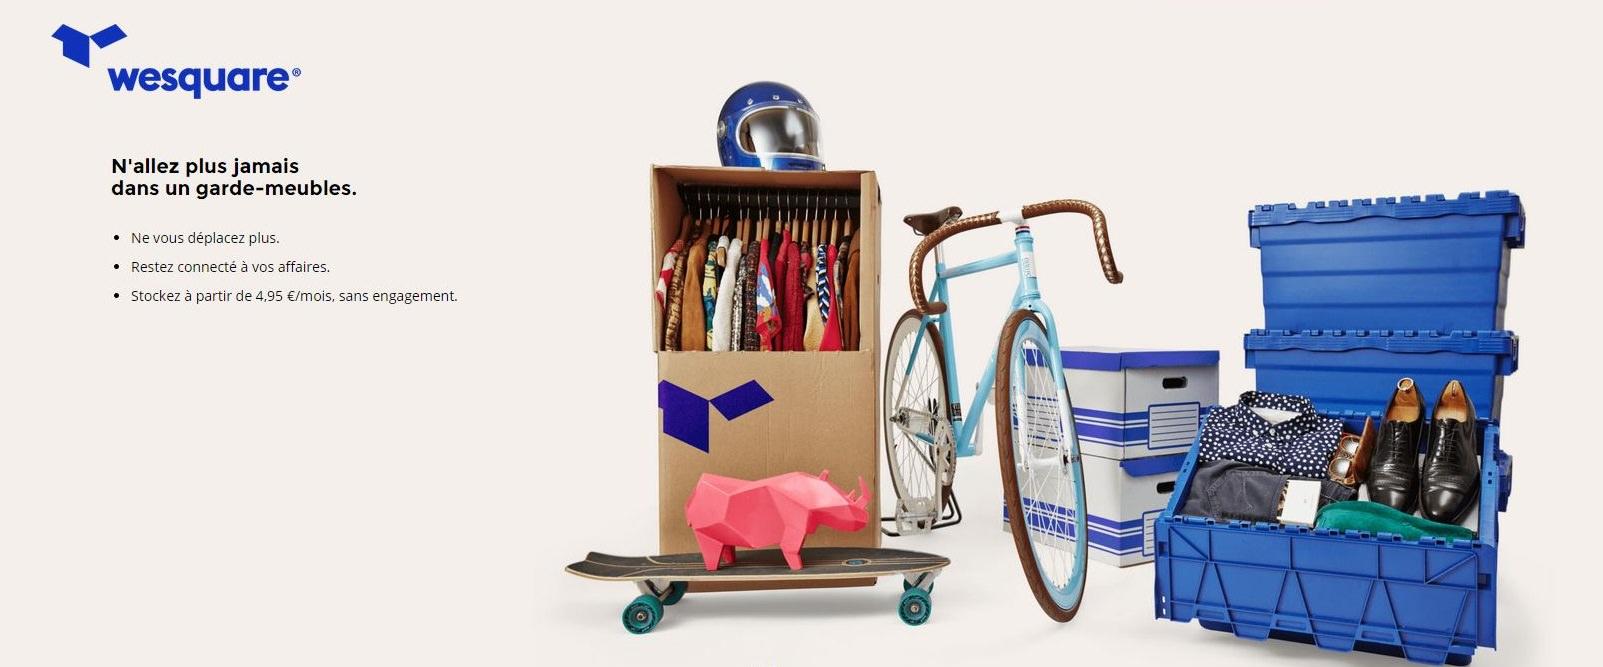 Wesquare-archivage-start-up-paris-blue-box-stockage-effronte-01.jpg